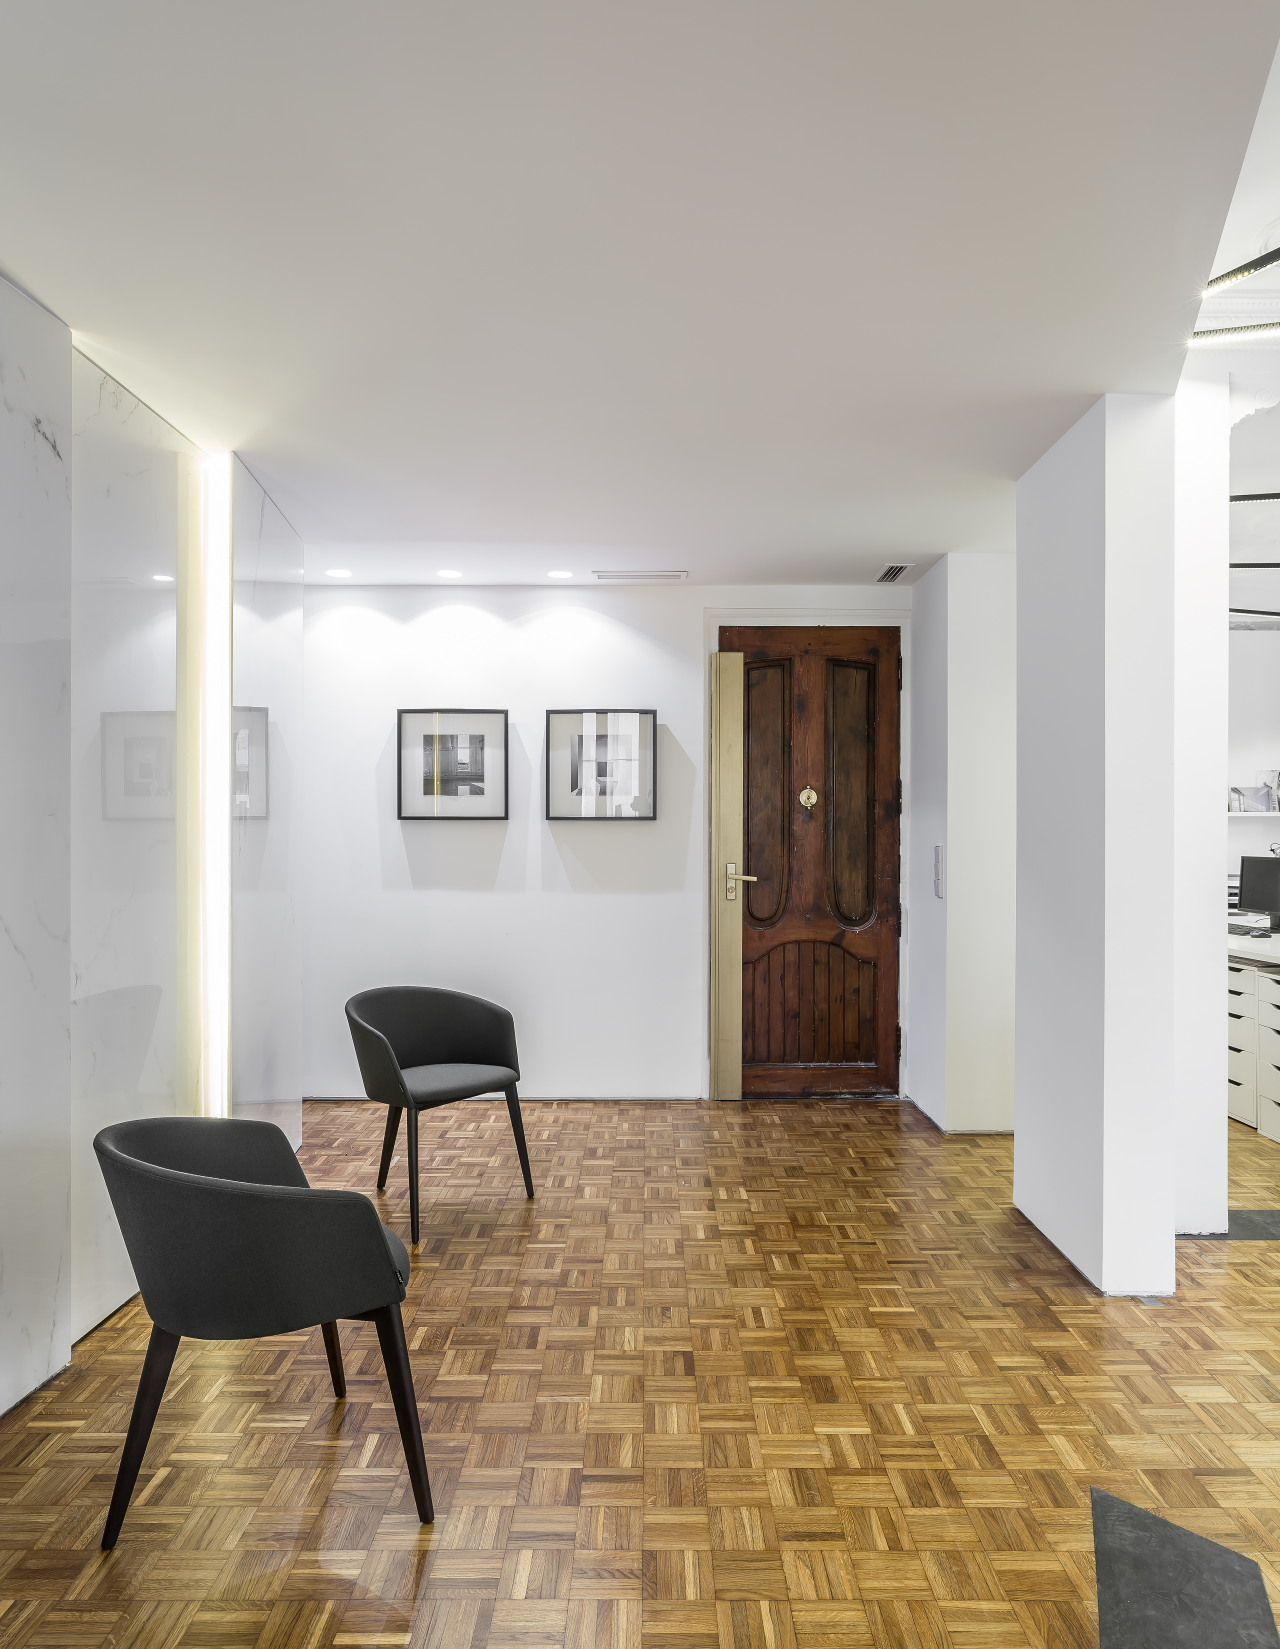 fotografia-arquitectura-interiorismo-valencia-german-cabo-viraje-estudio-pujol (2)